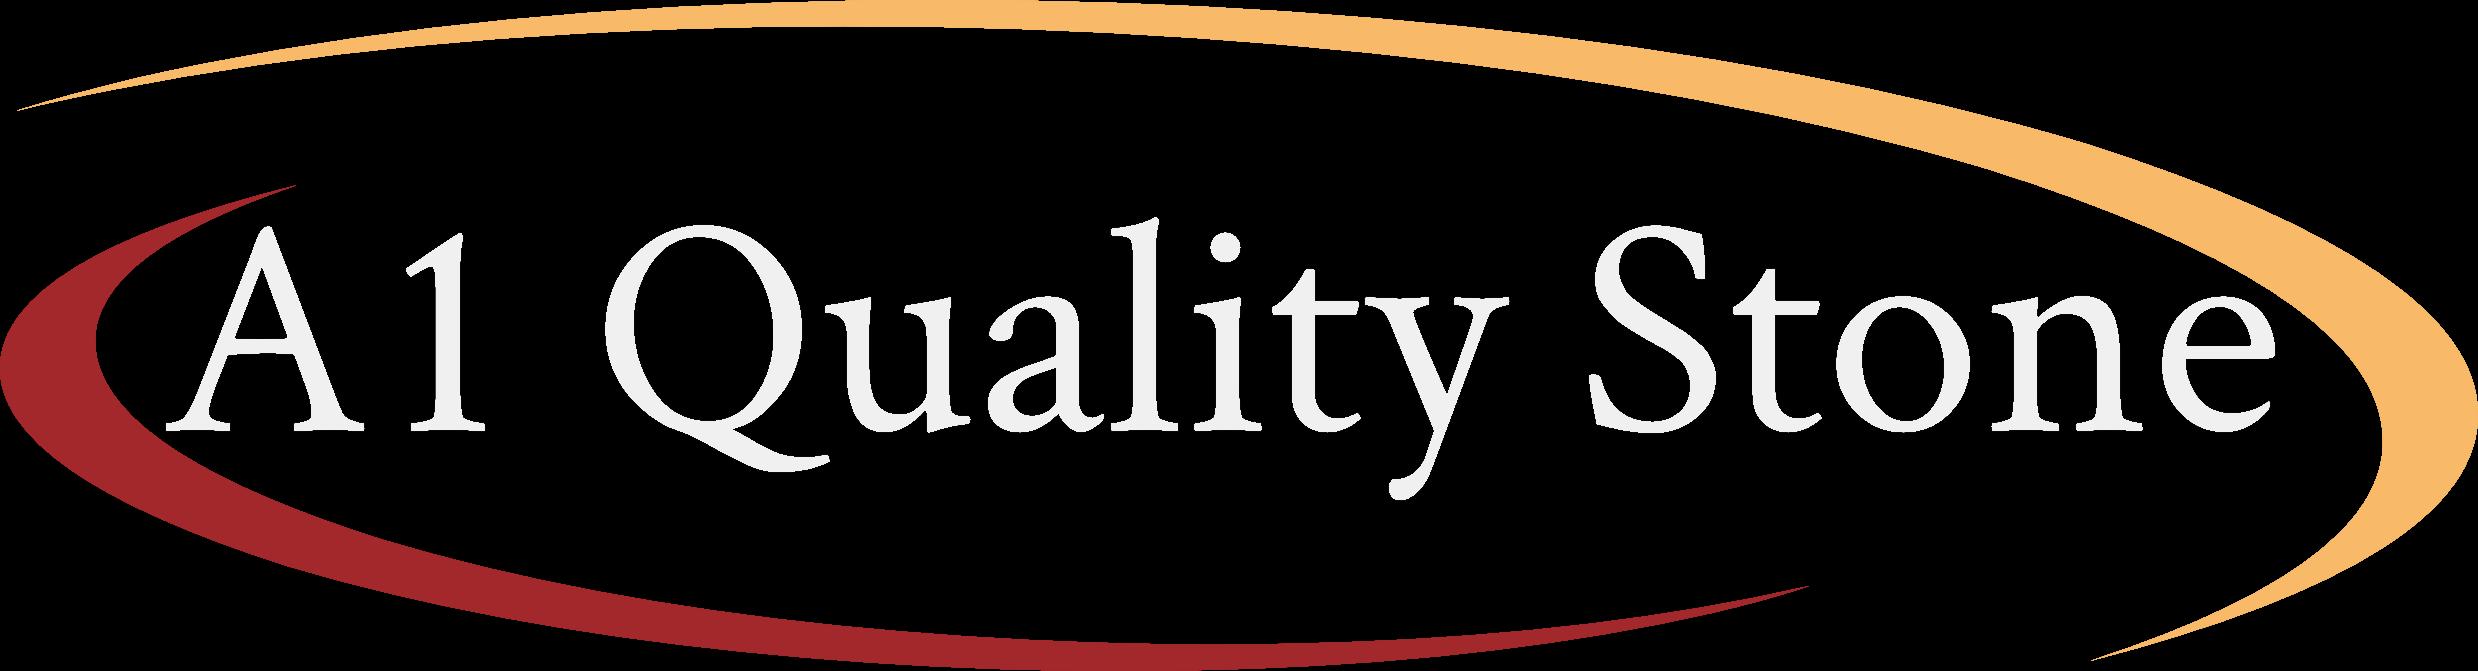 A1 Quality Stone